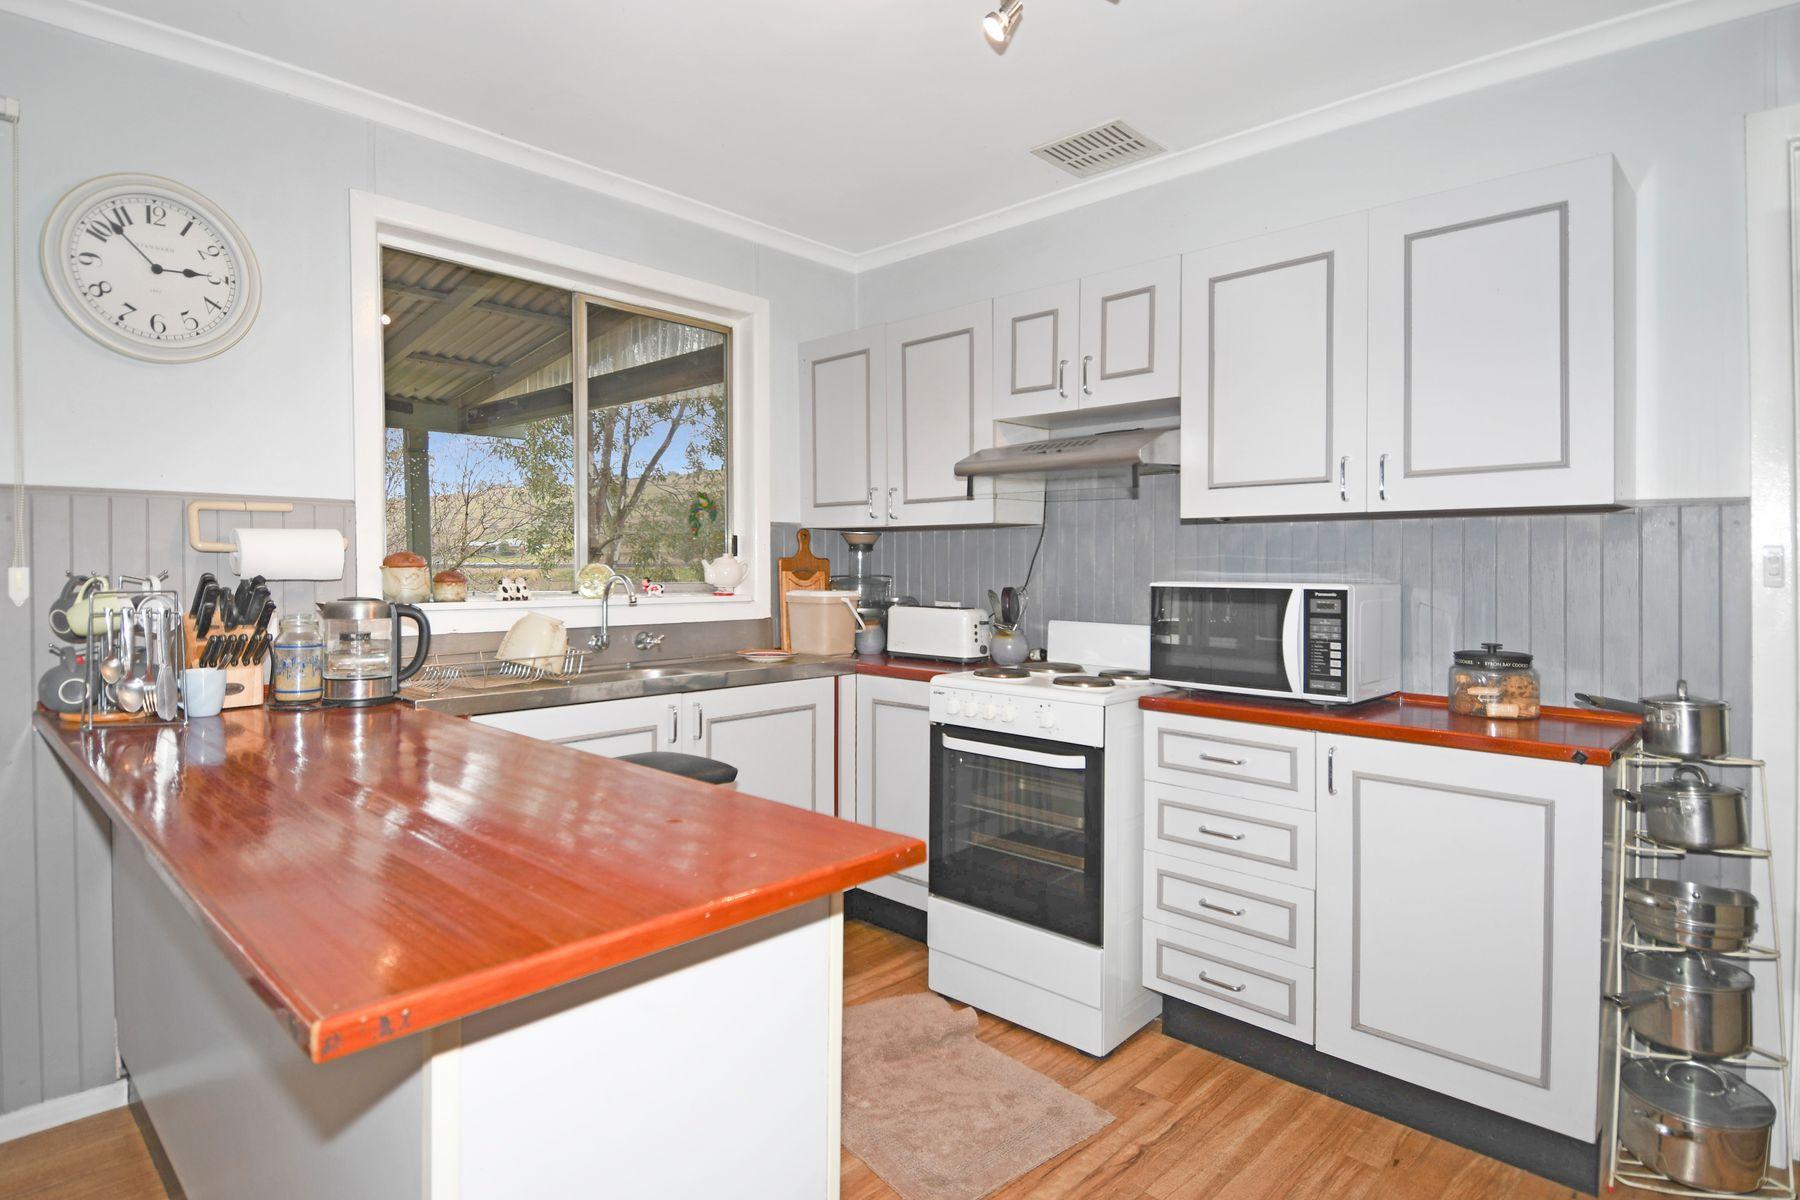 3 Bridge Street, Perthville, NSW 2795